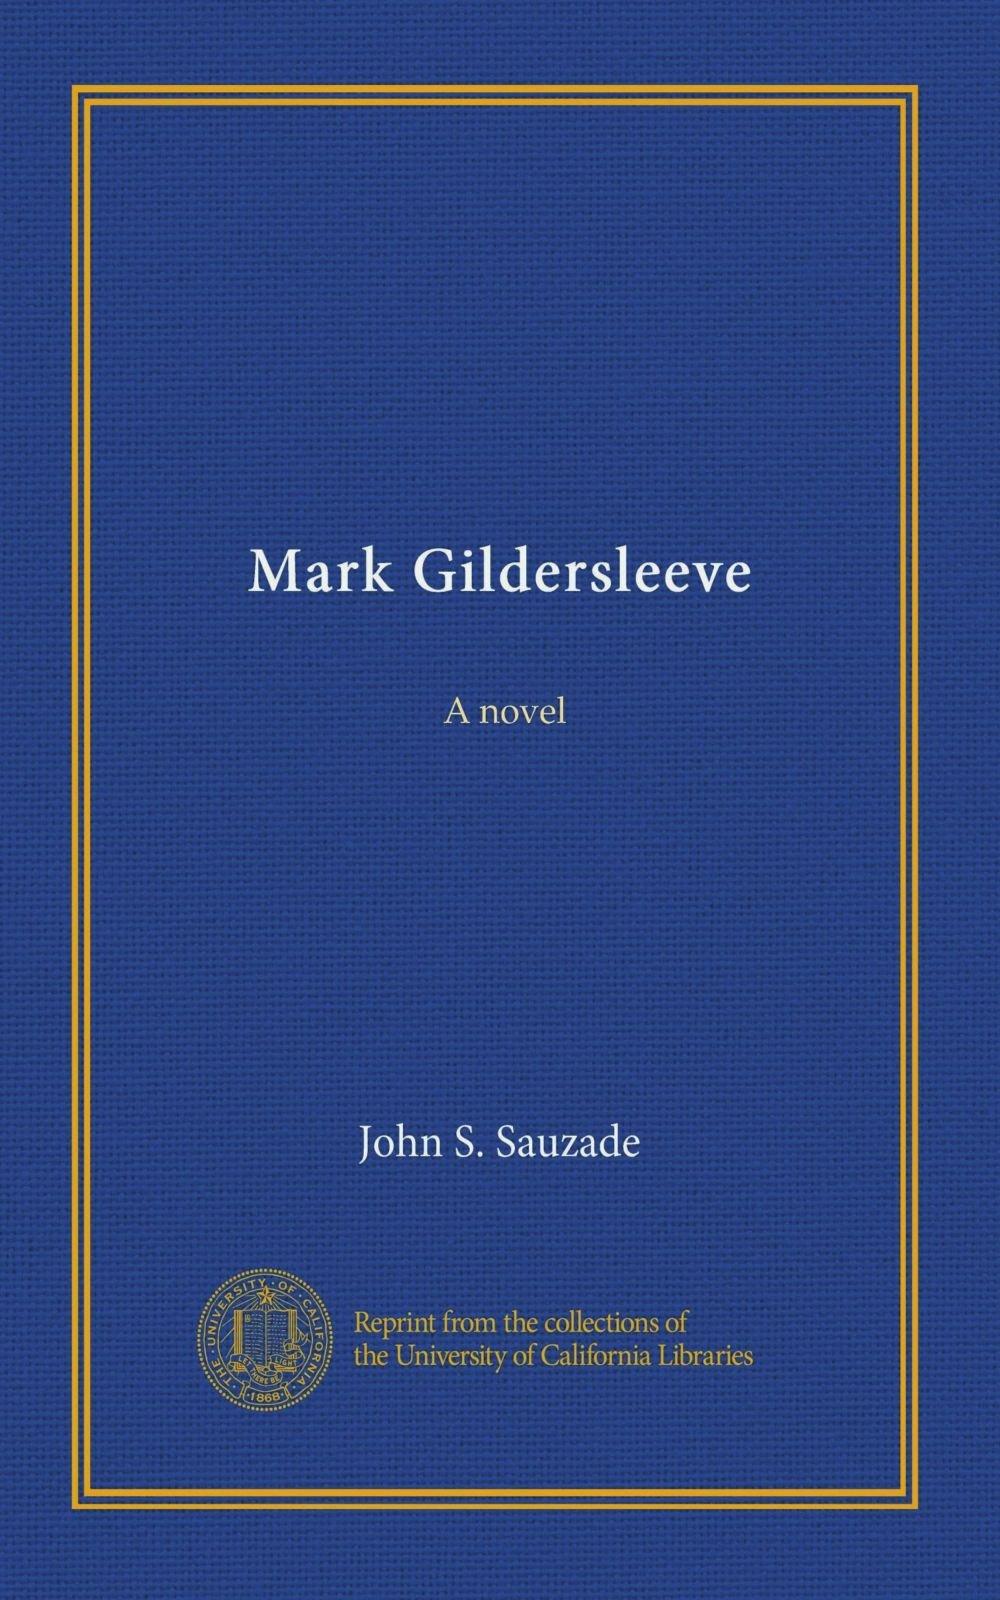 Download Mark Gildersleeve: A novel pdf